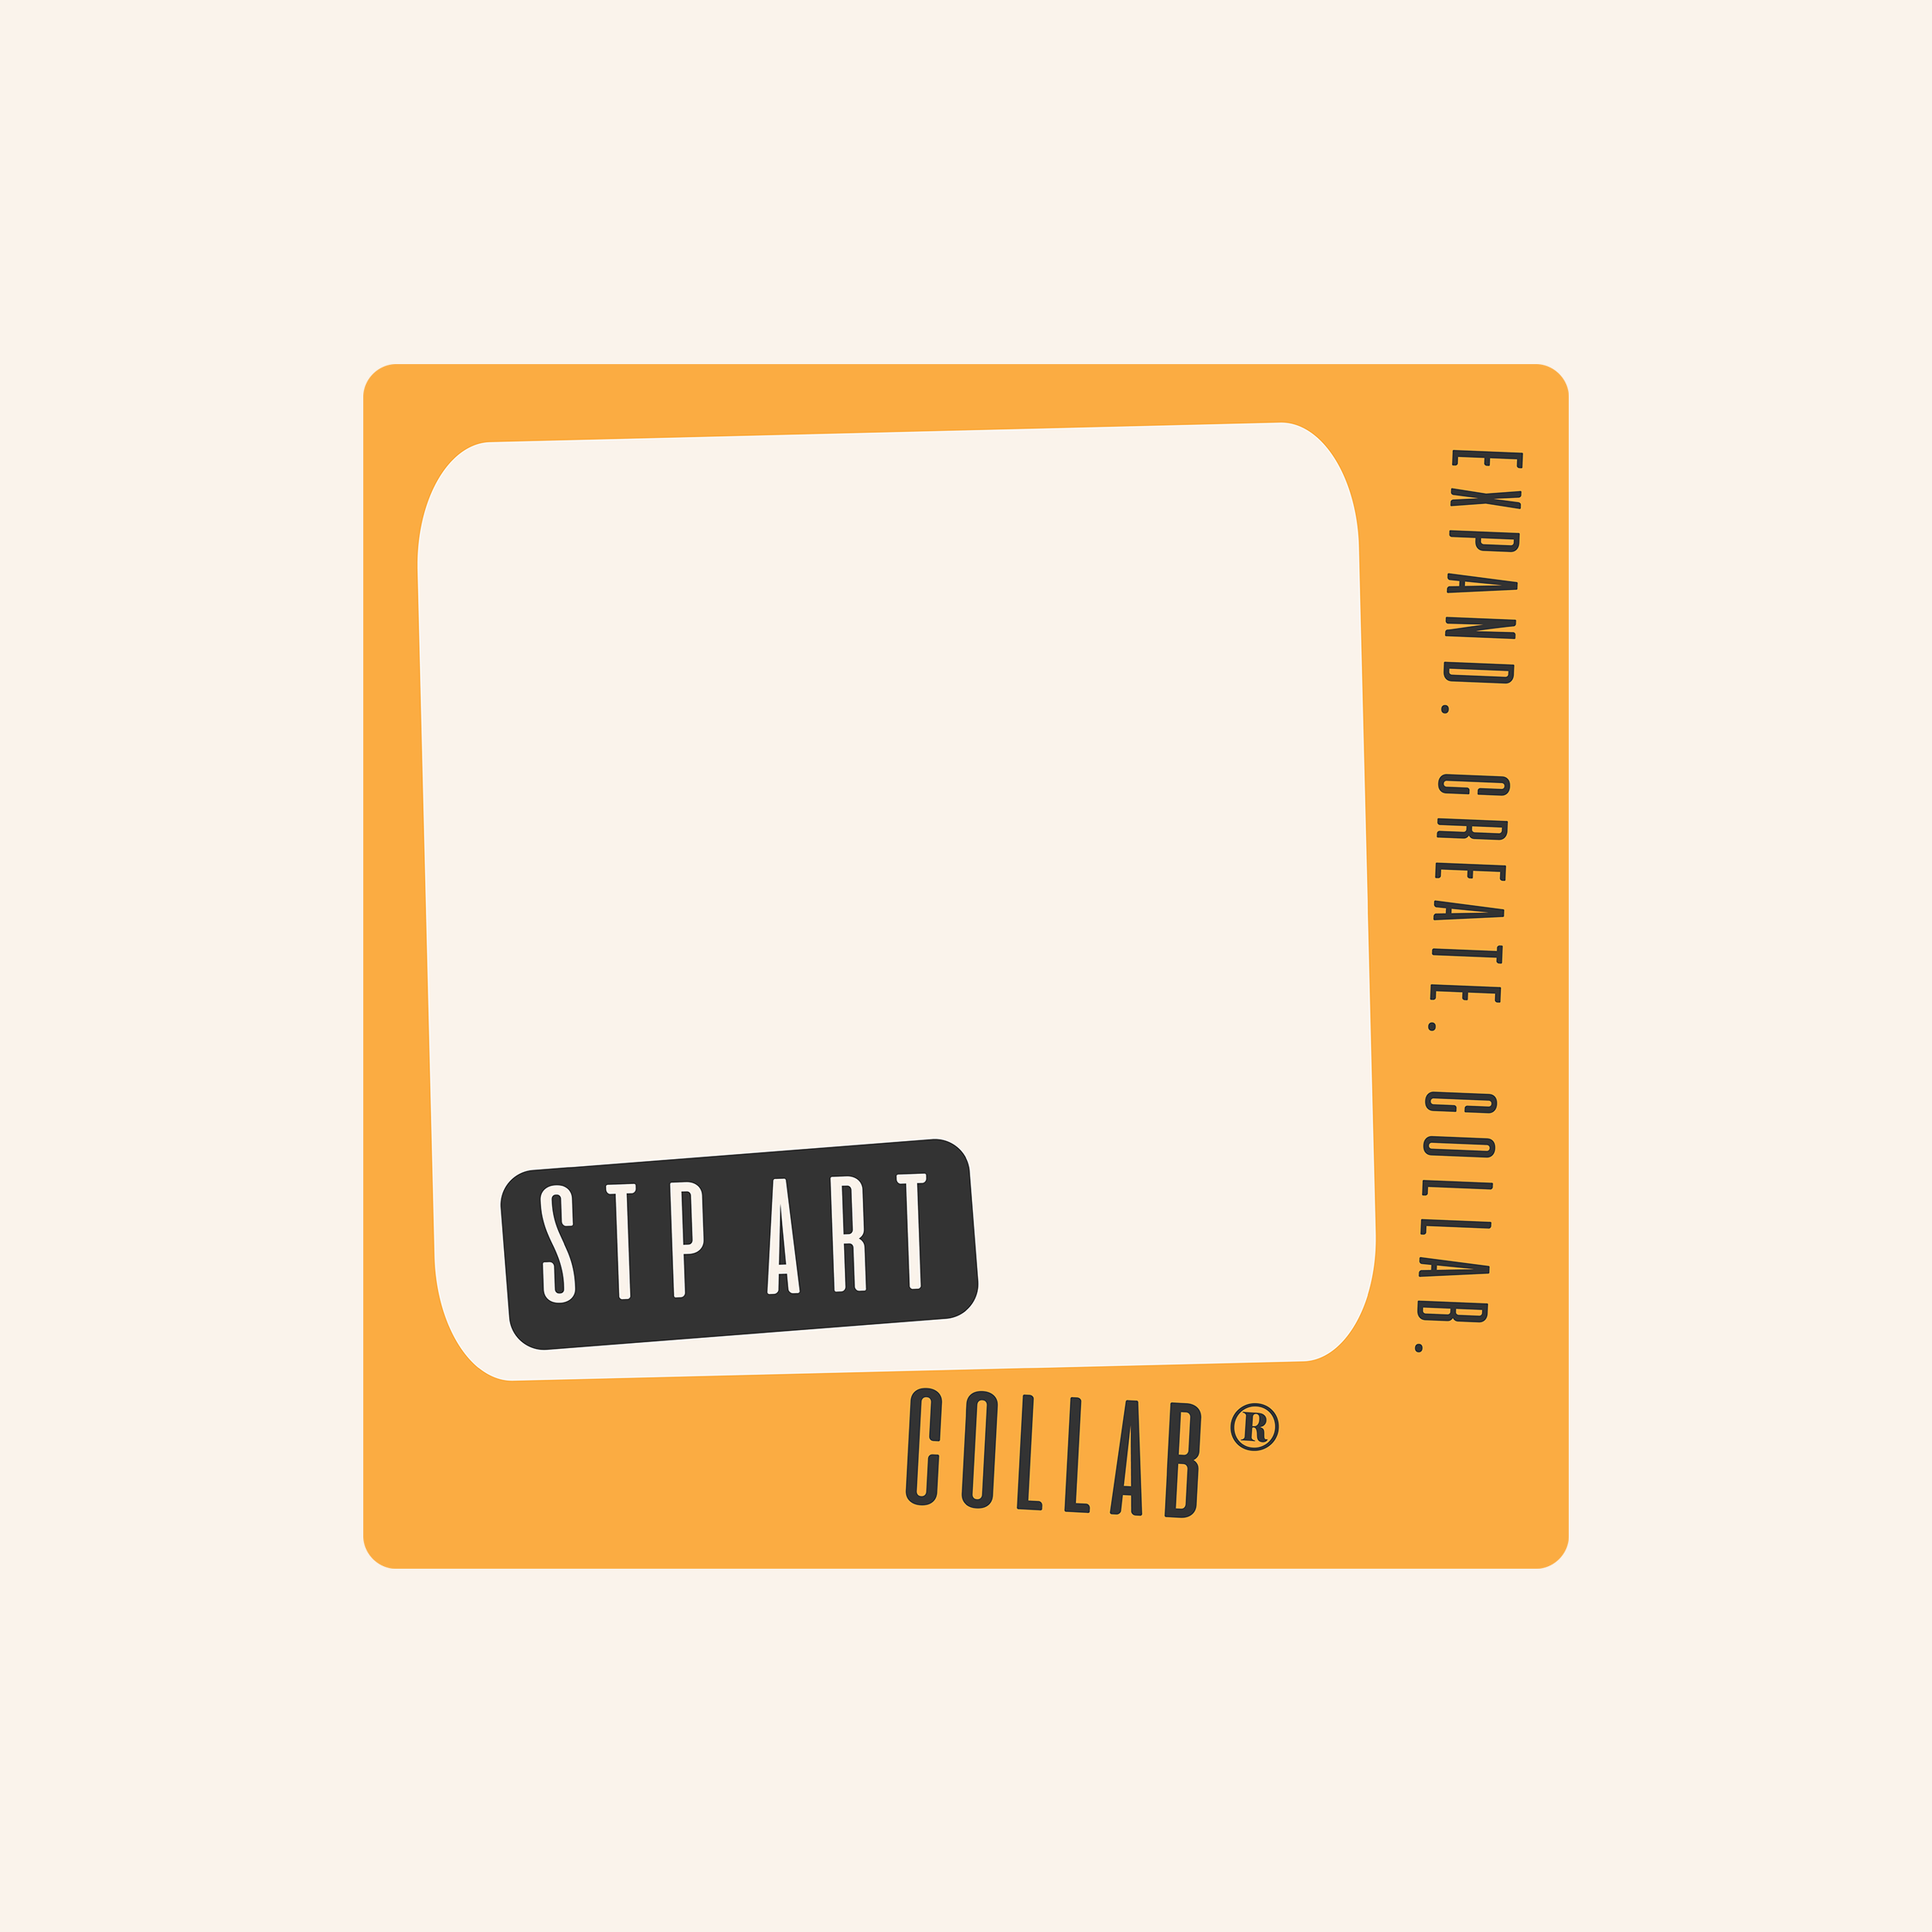 STP Art Collab Logo